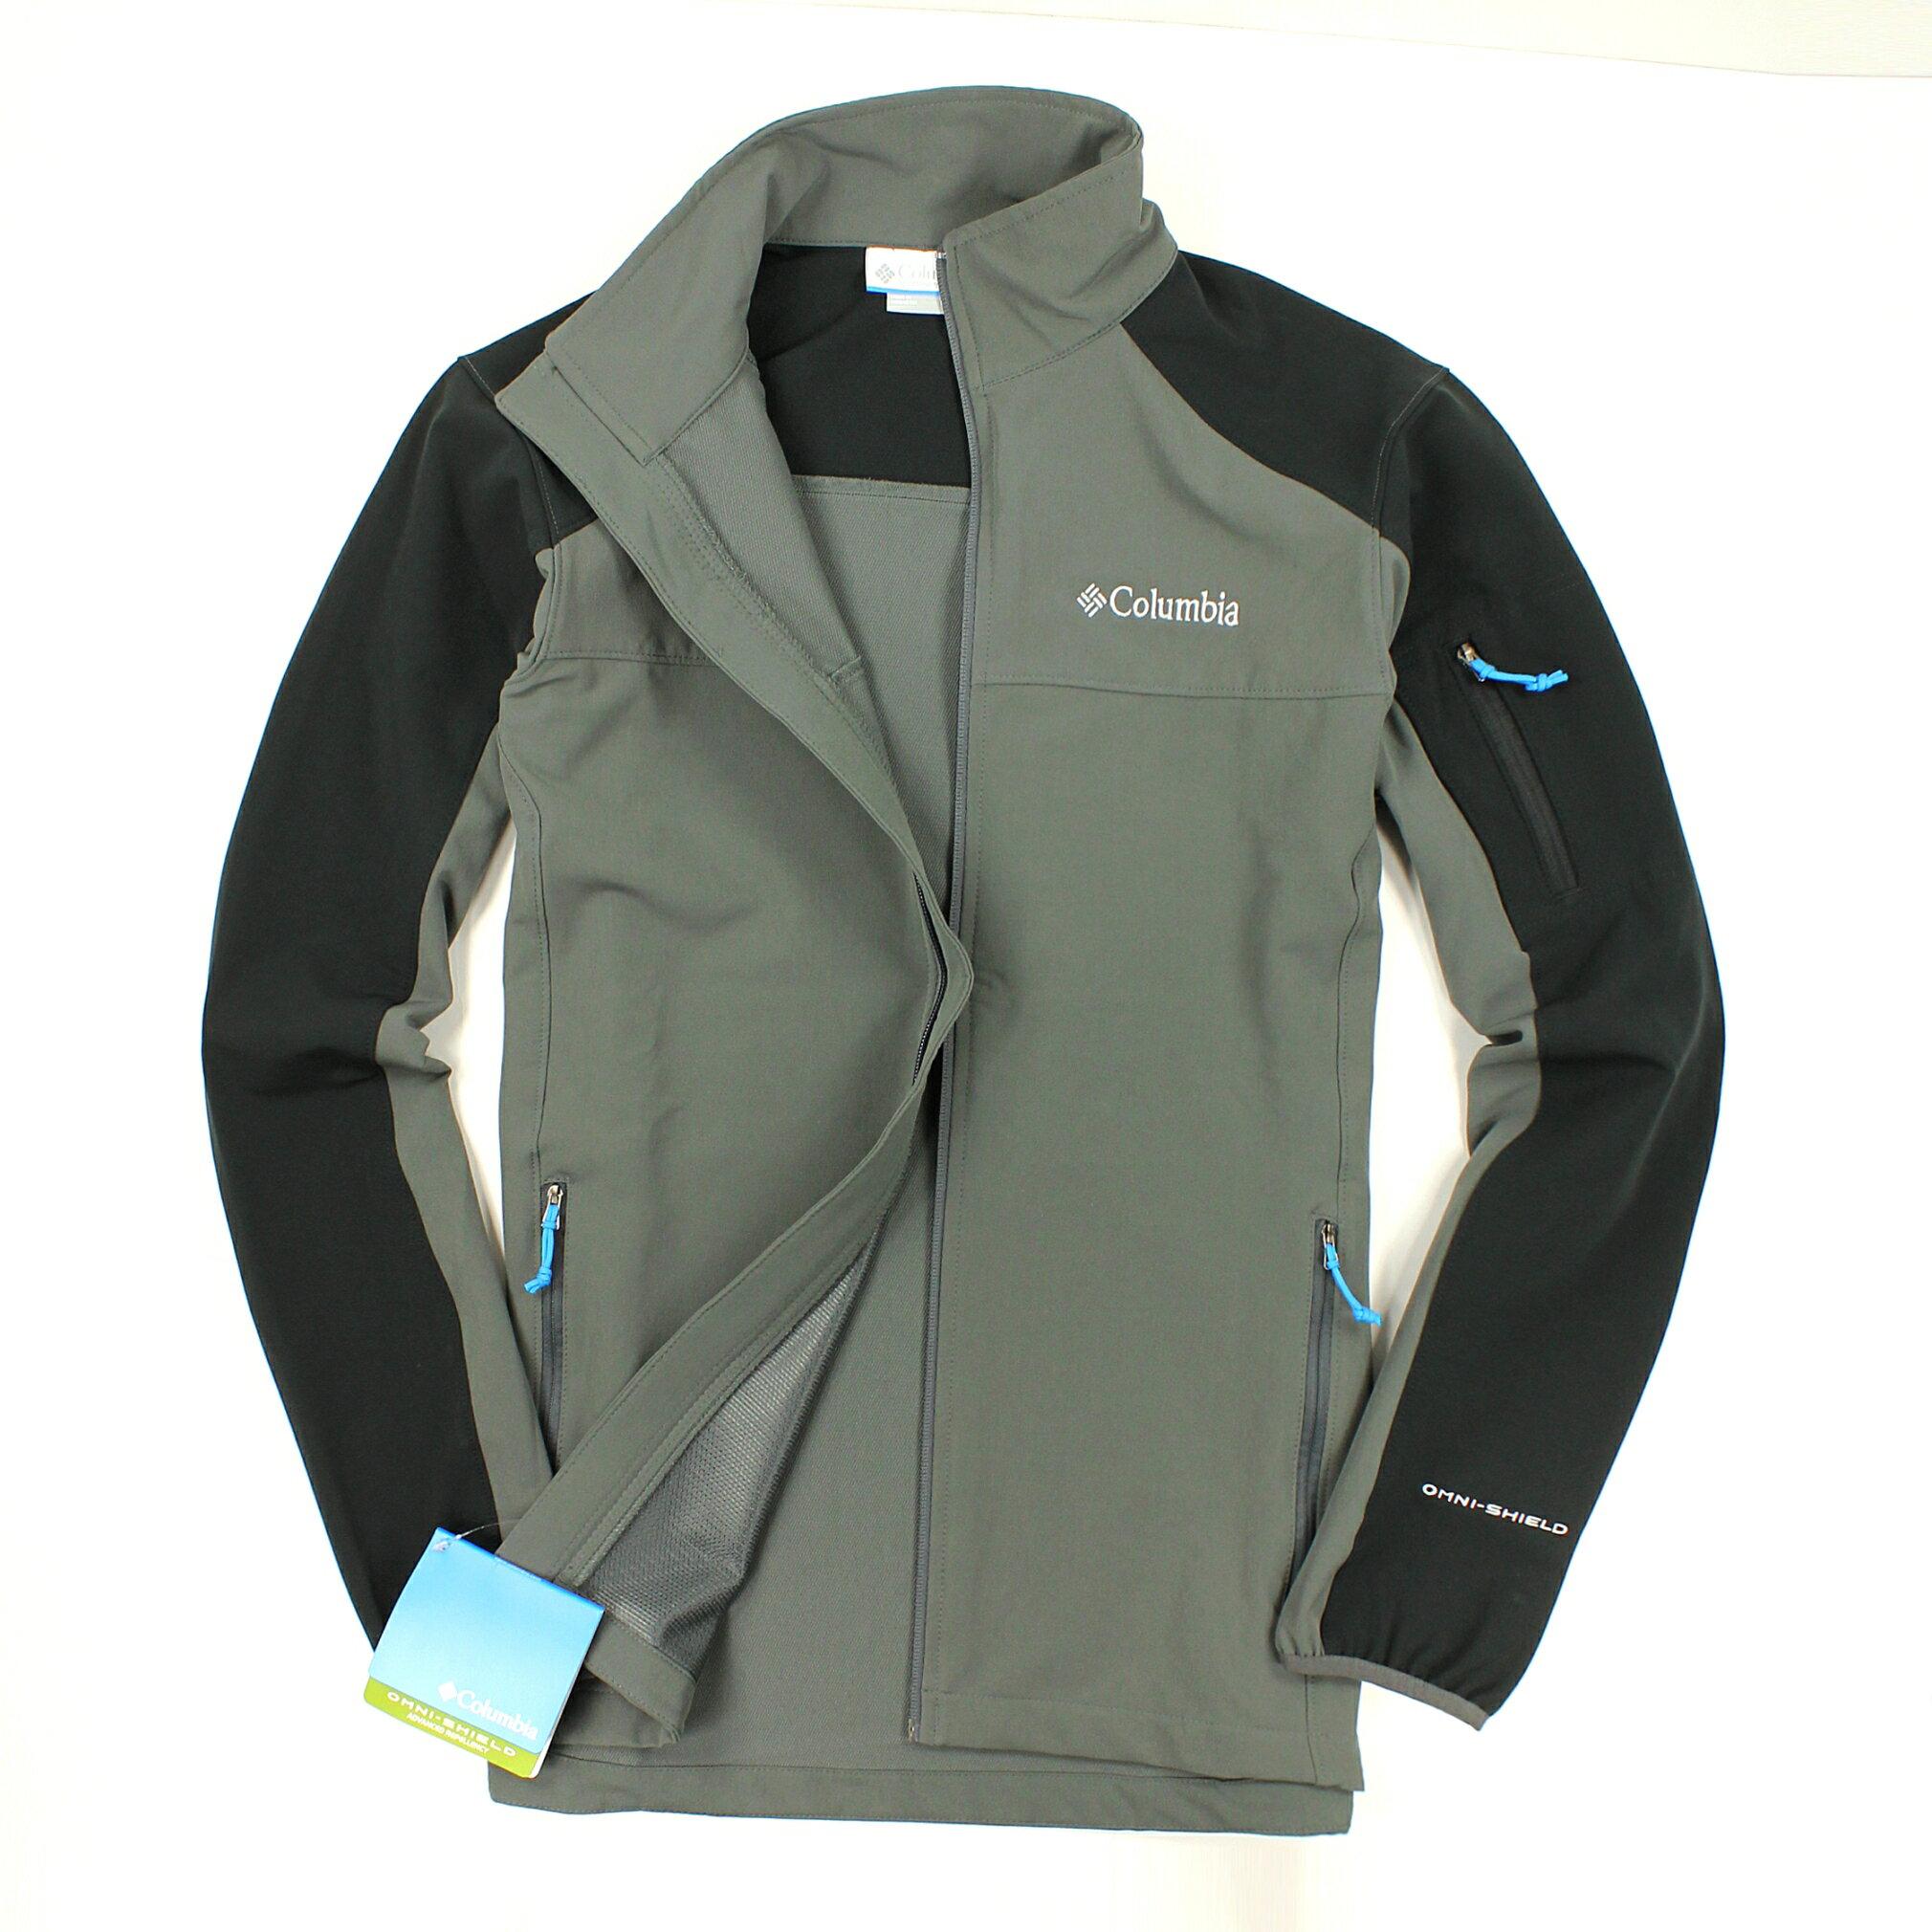 美國百分百【全新真品】Columbia 外套 哥倫比亞 夾克 Omni shield 防水 防汙 灰黑 透氣 男 S號